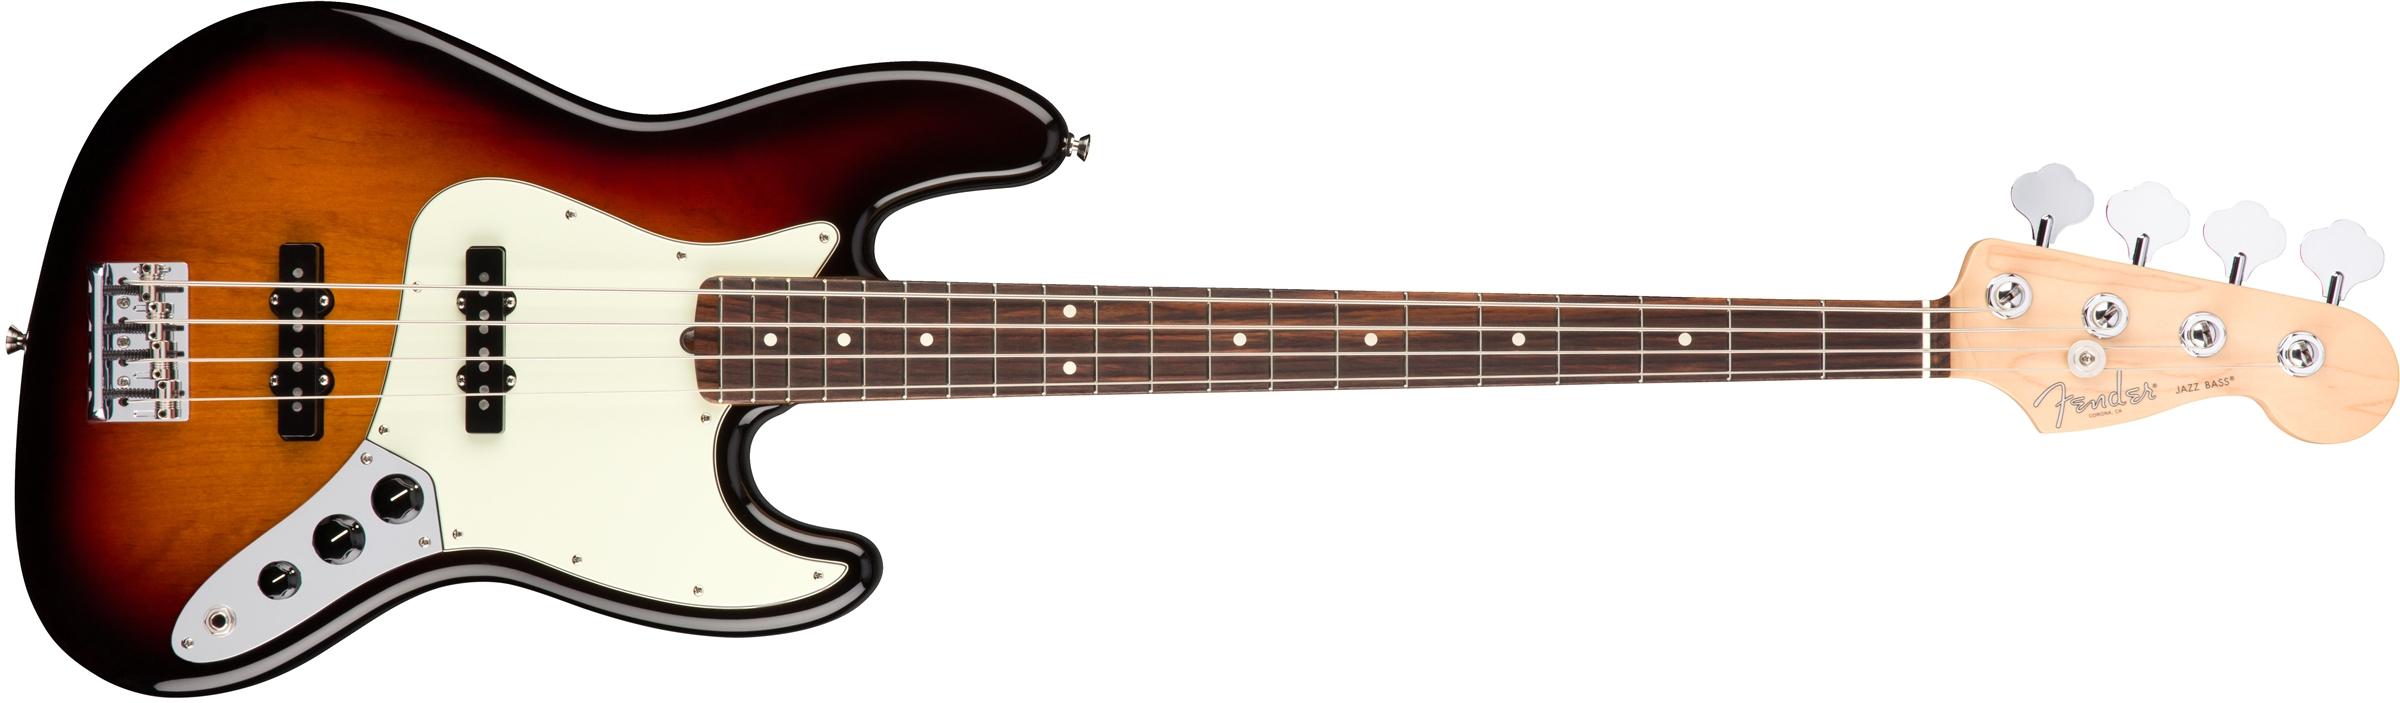 Jazz Bass.jpg